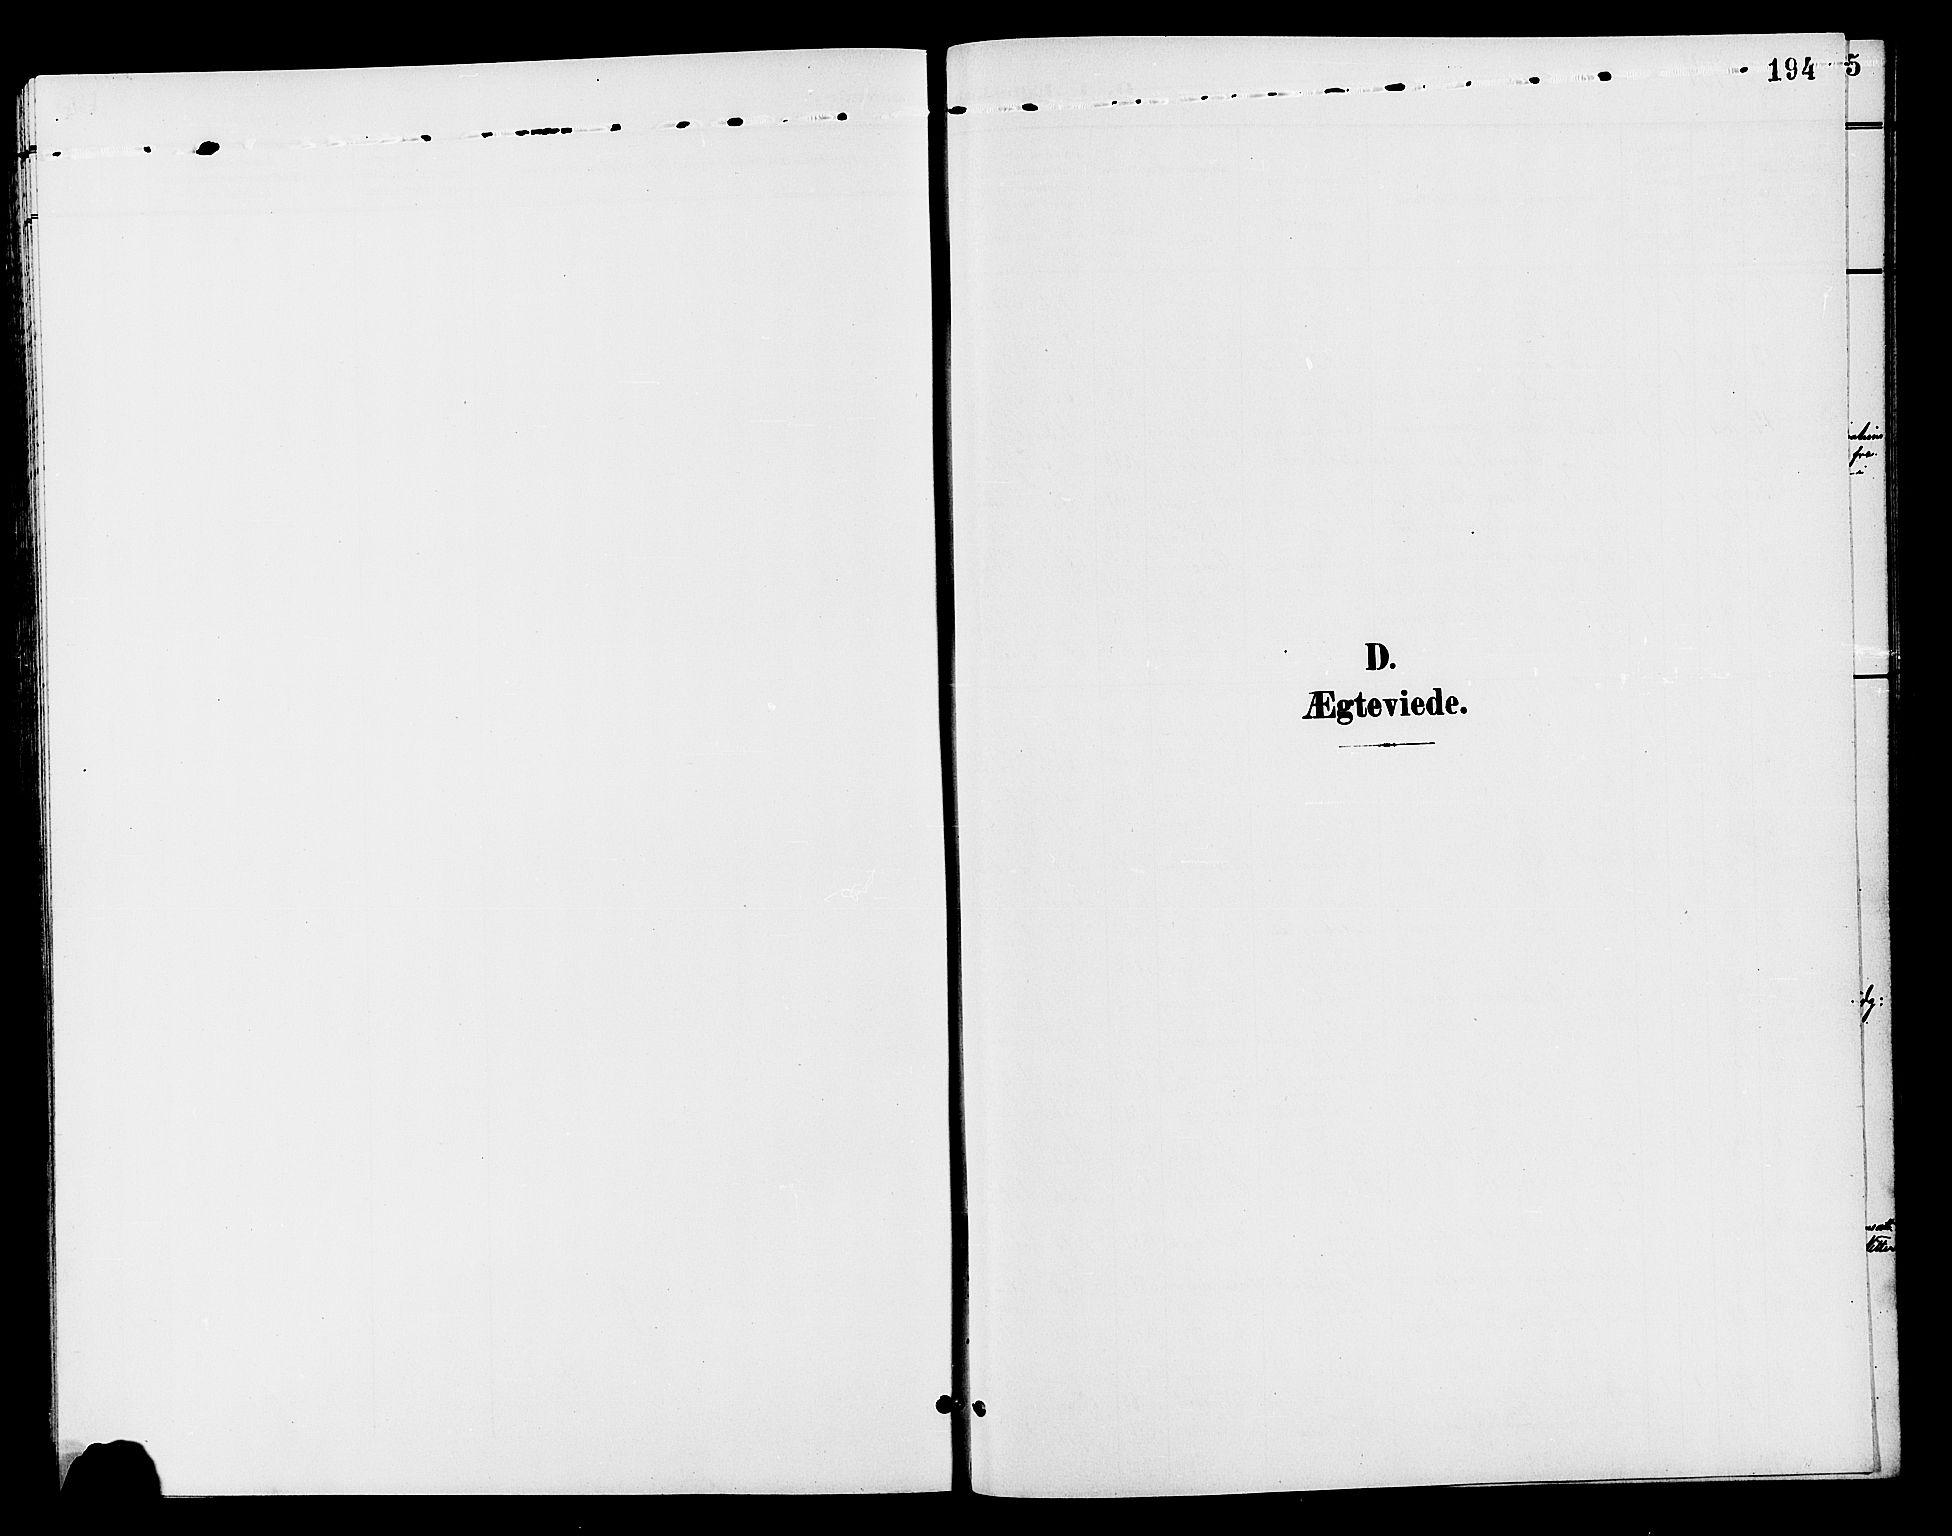 SAH, Østre Toten prestekontor, Klokkerbok nr. 7, 1901-1912, s. 194